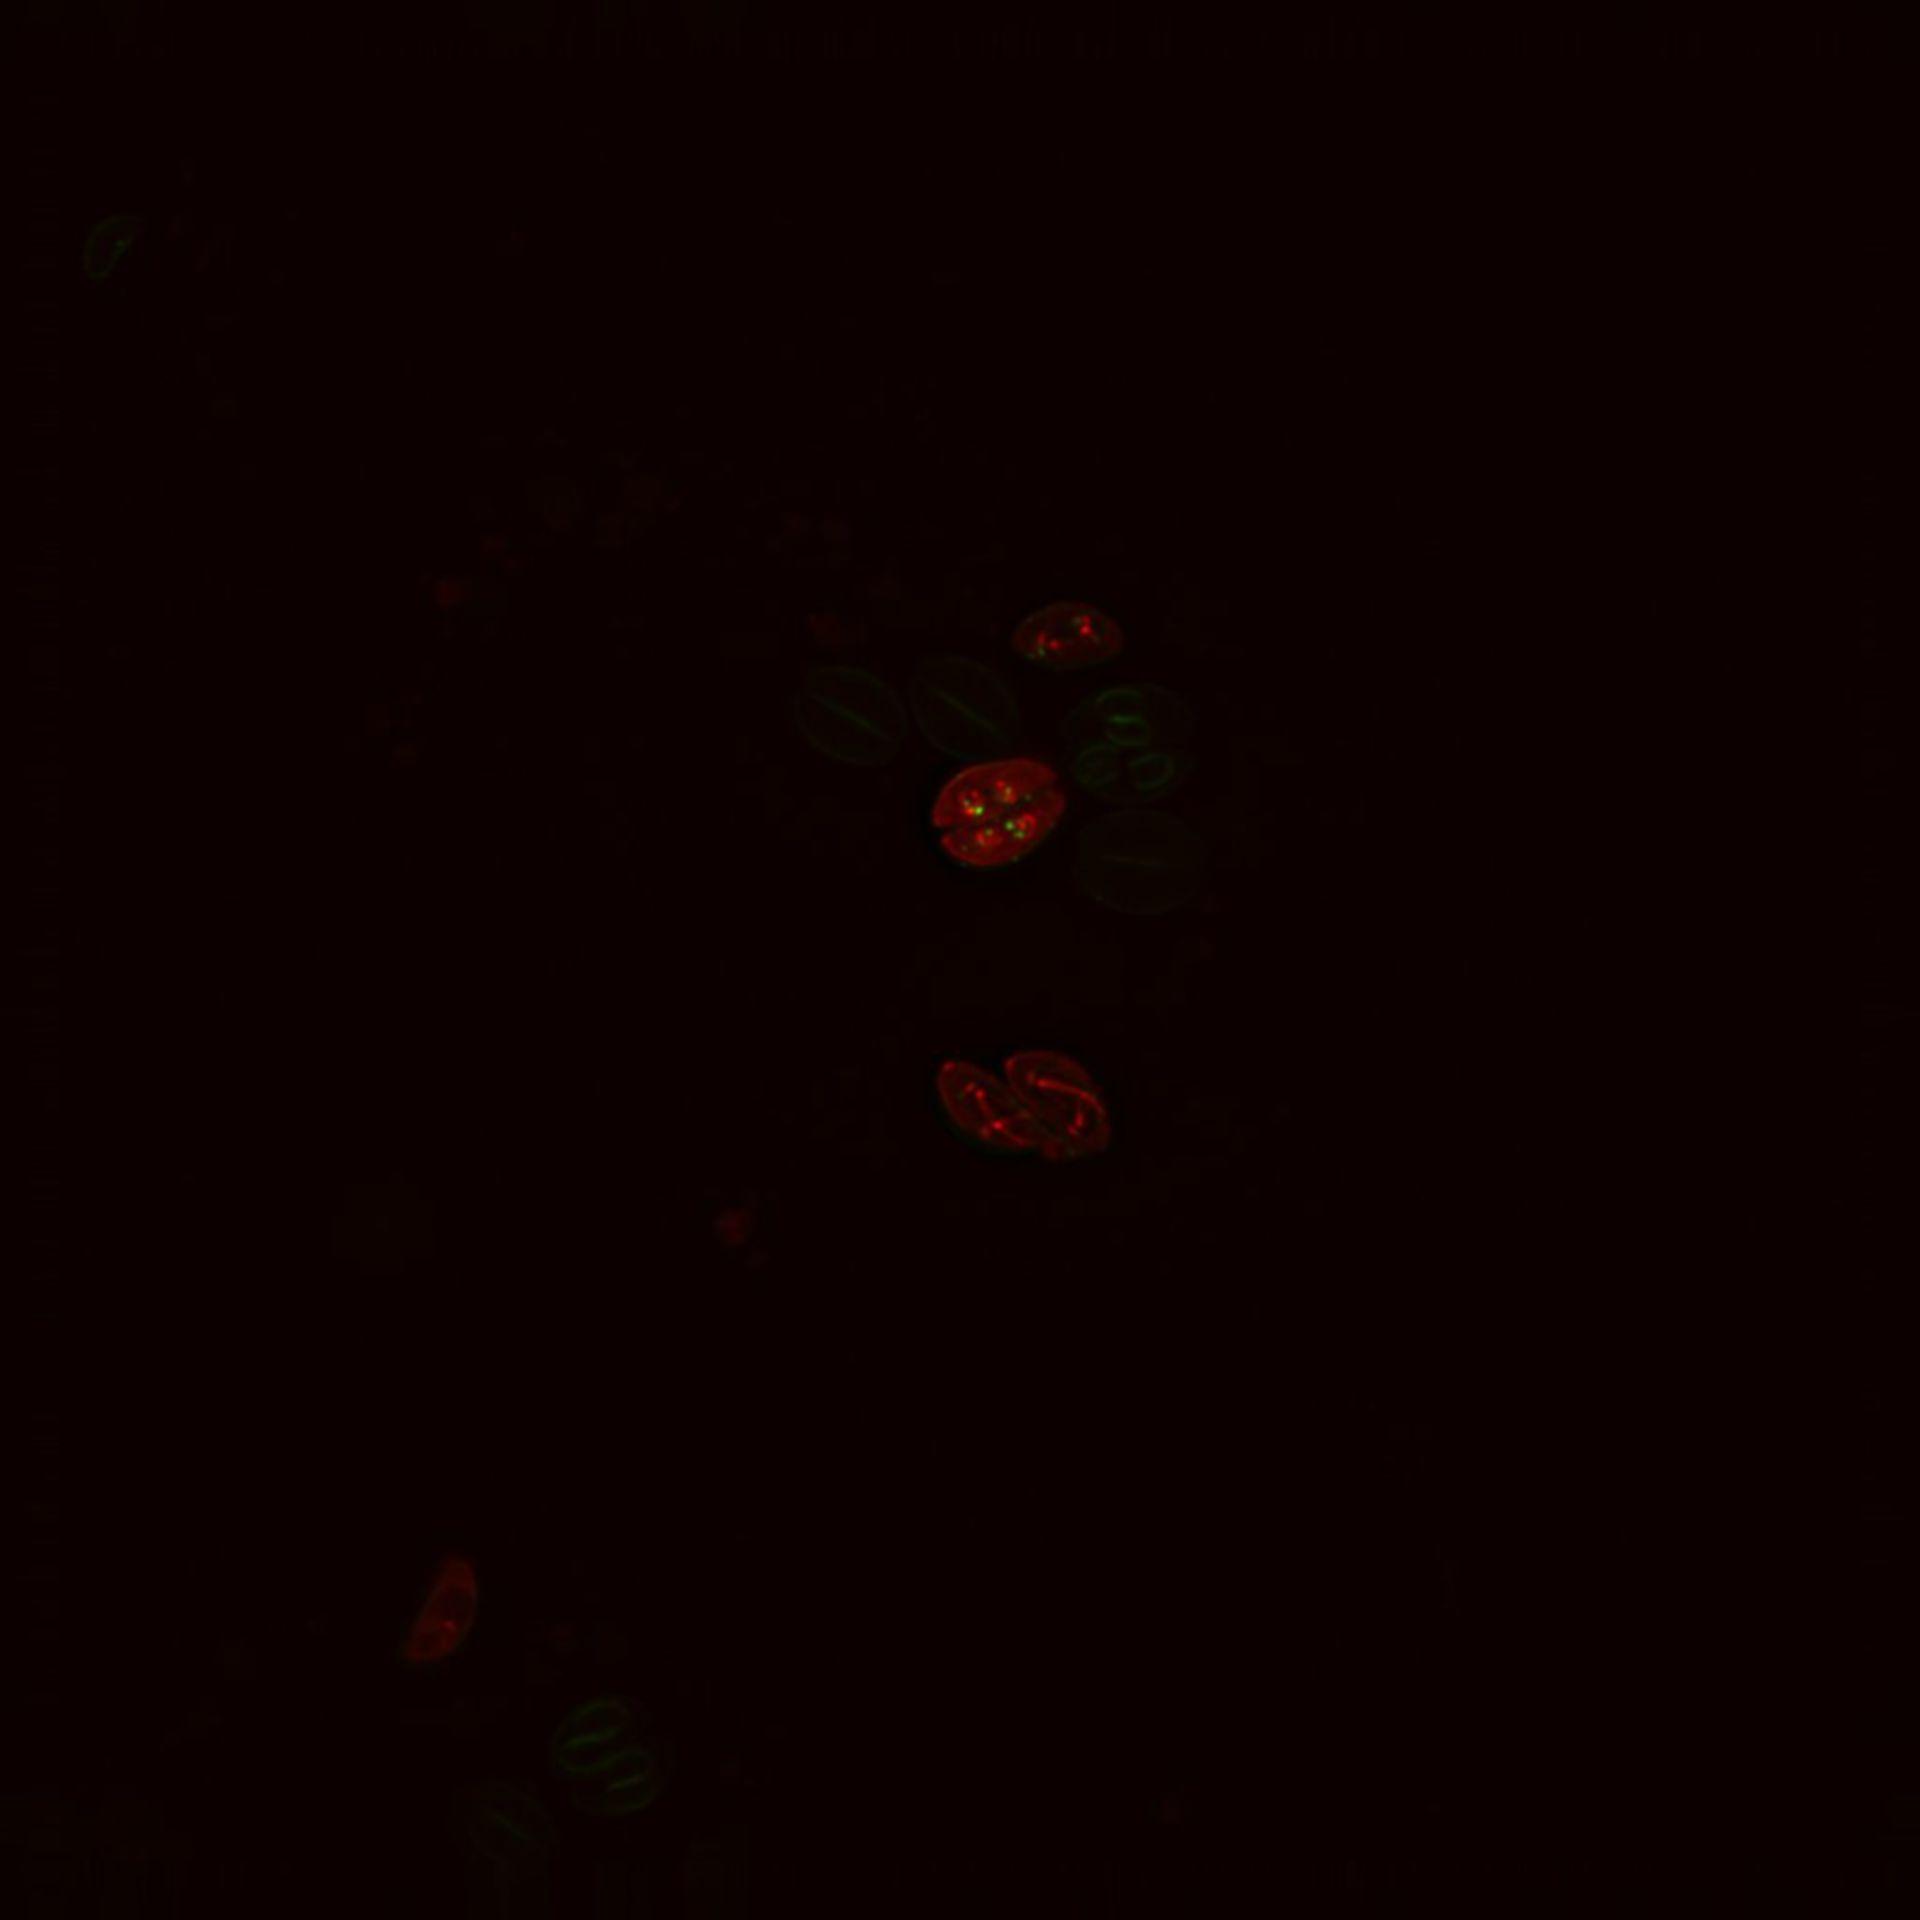 Toxoplasma gondii RH (Inner membrane complex) - CIL:10547